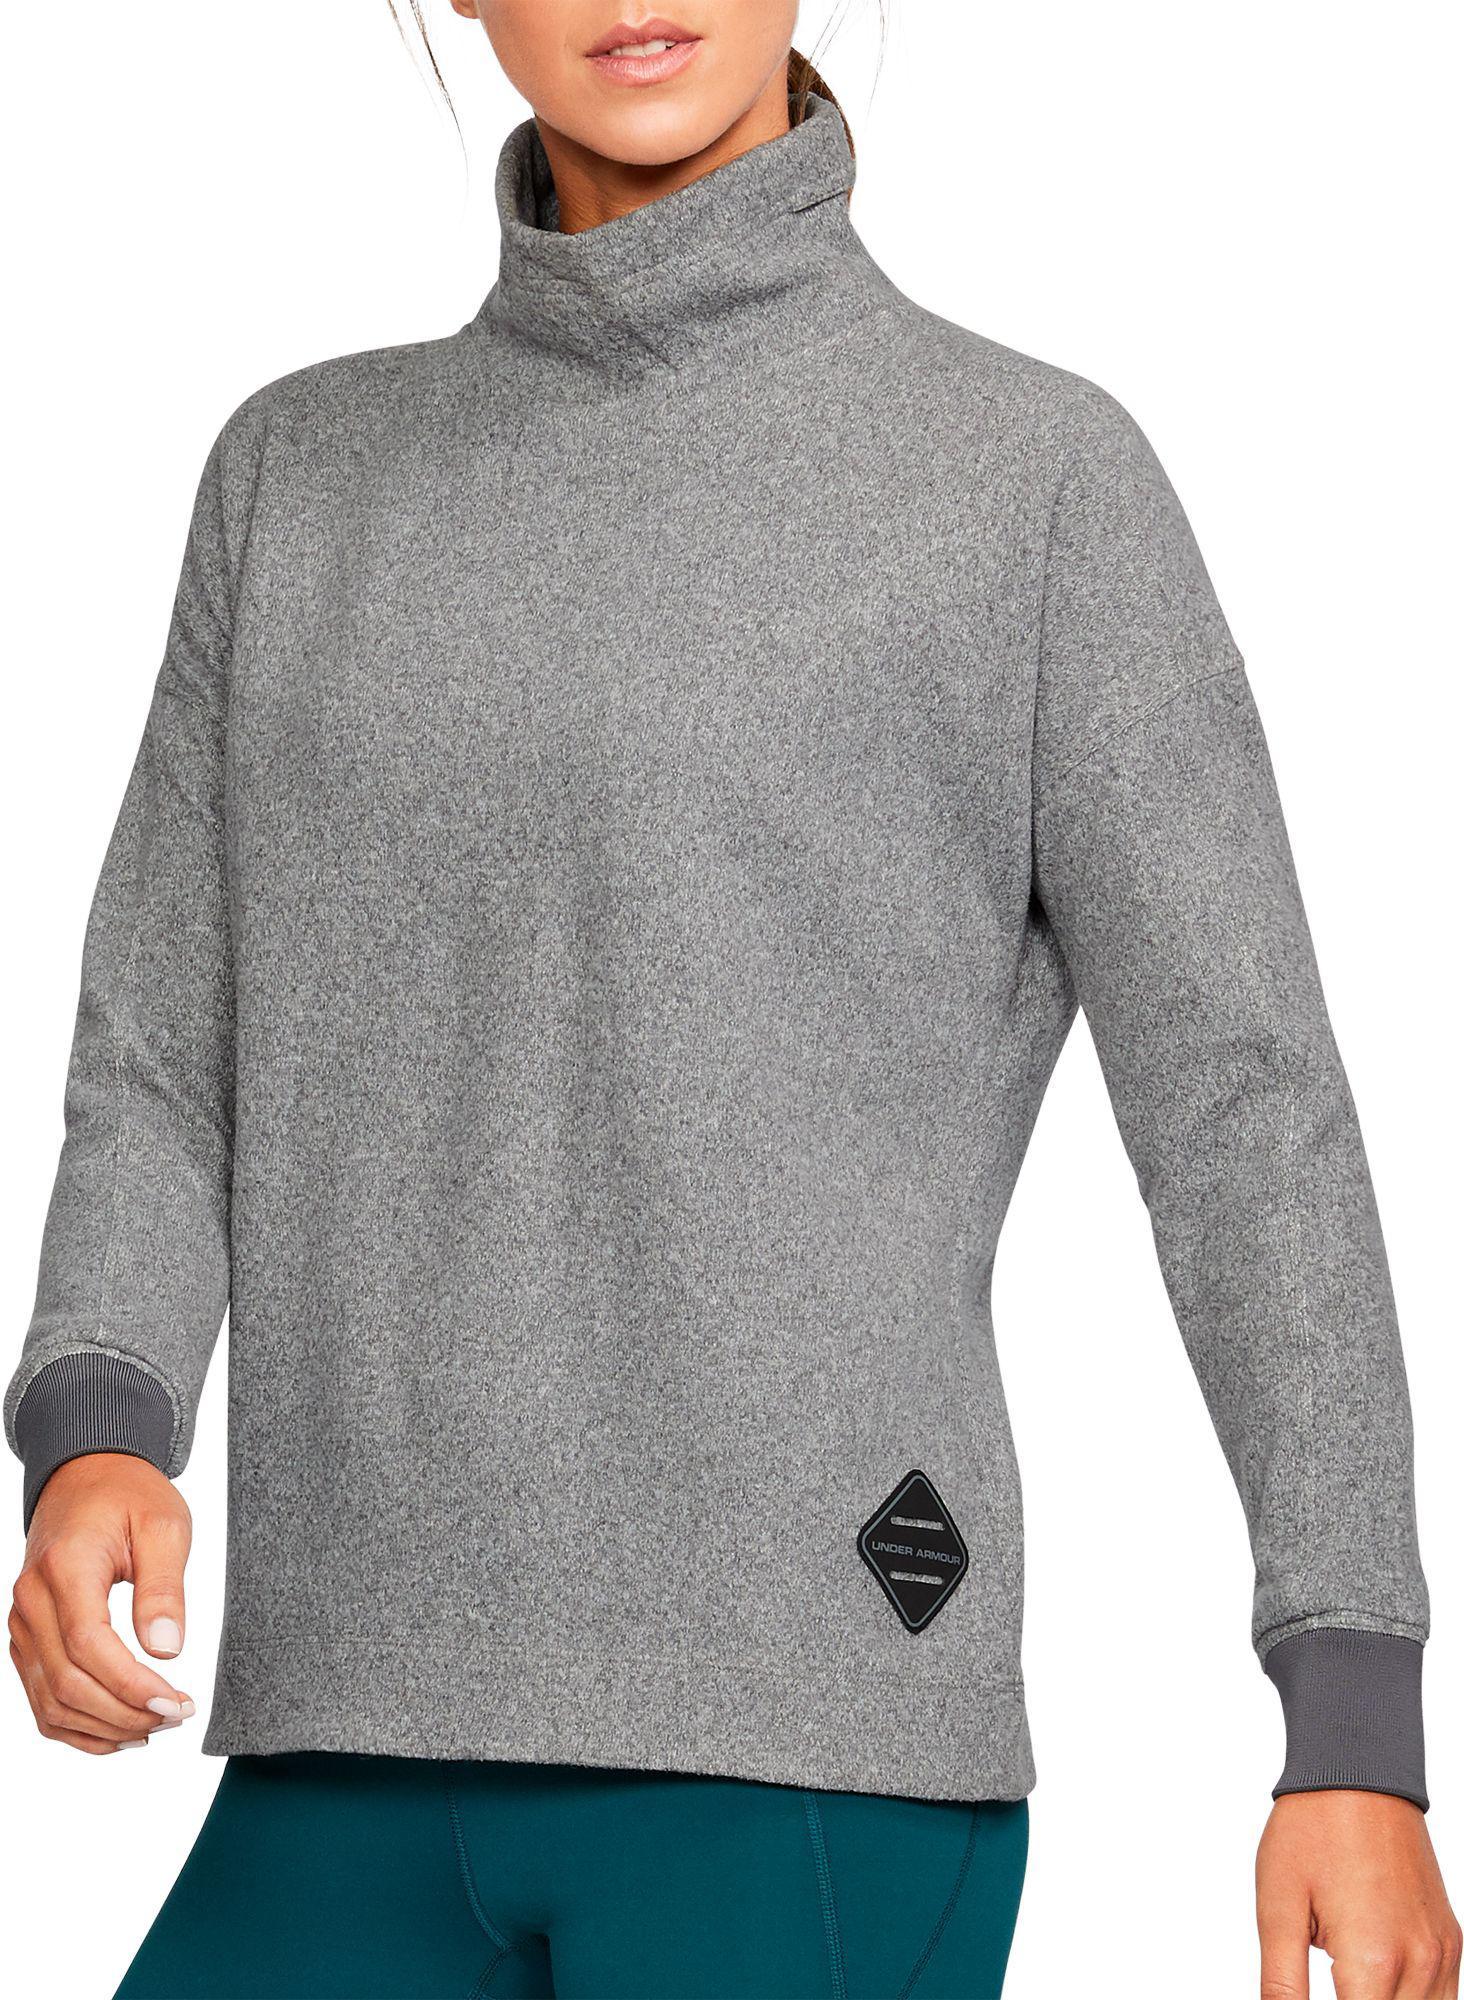 Lyst Under Armour Sweater Fleece Funnel Neck Sweatshirt